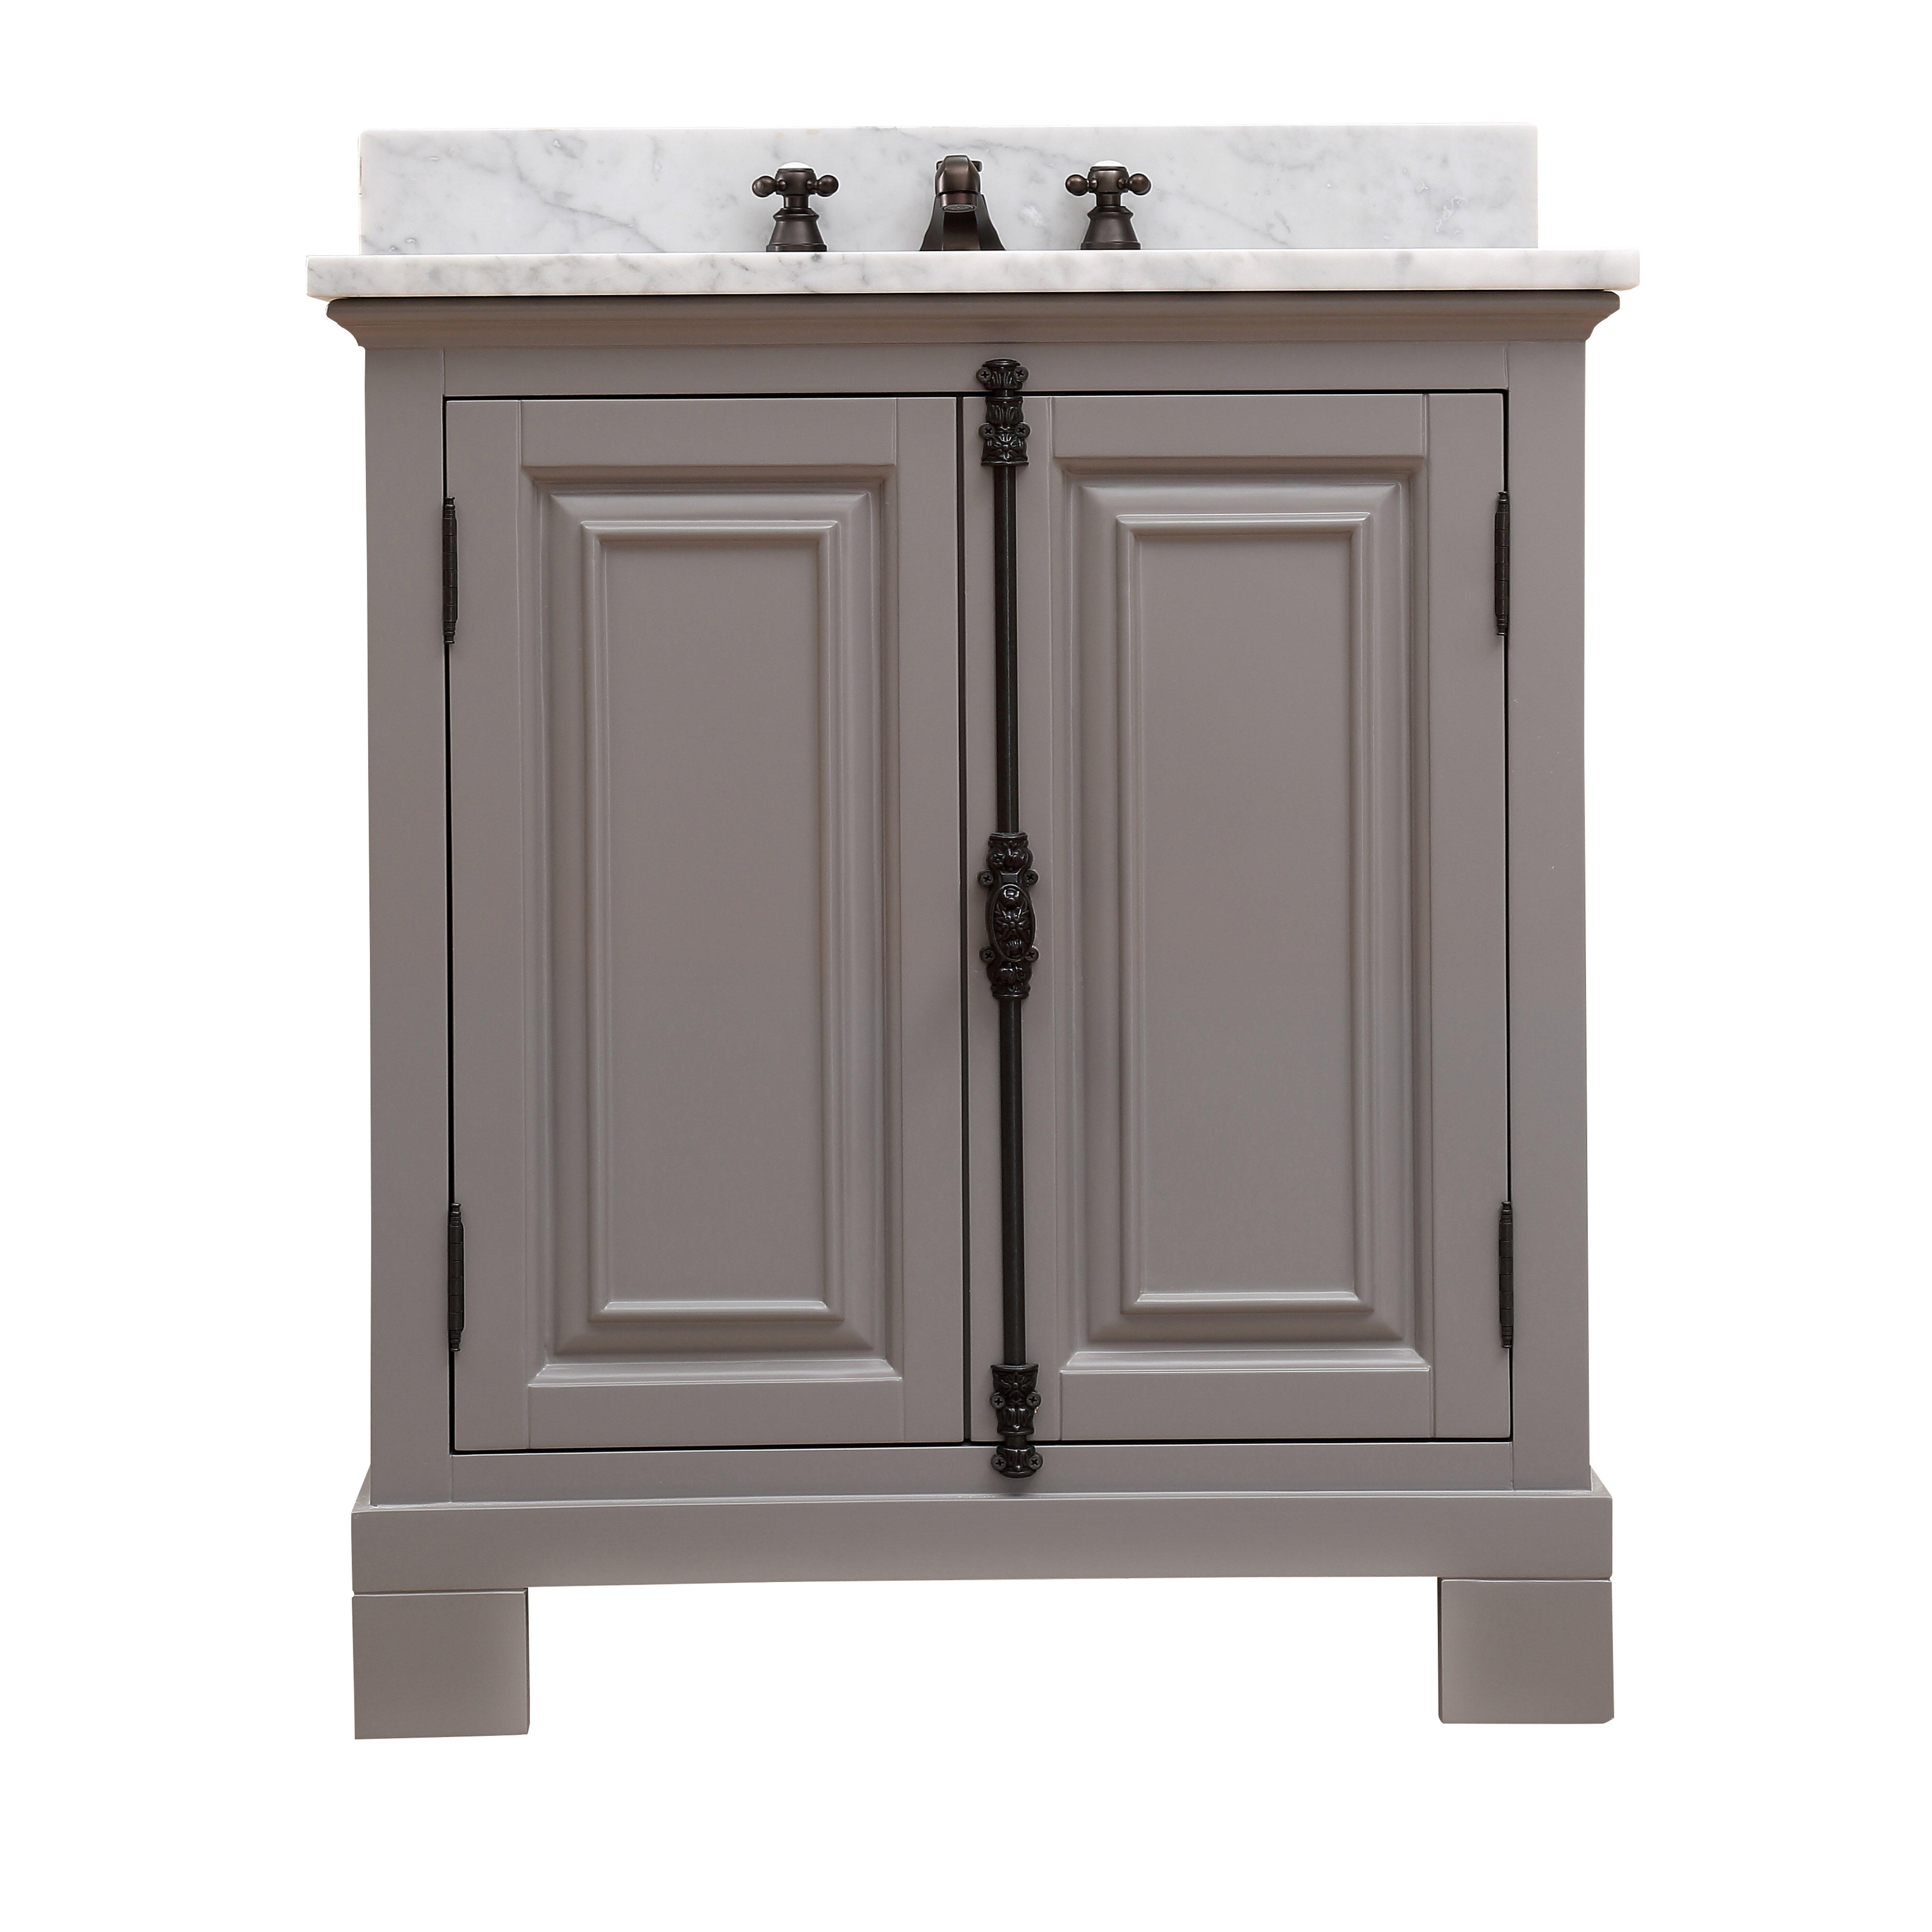 "dCOR design Freemont 30"" Single Bathroom Vanity Set"